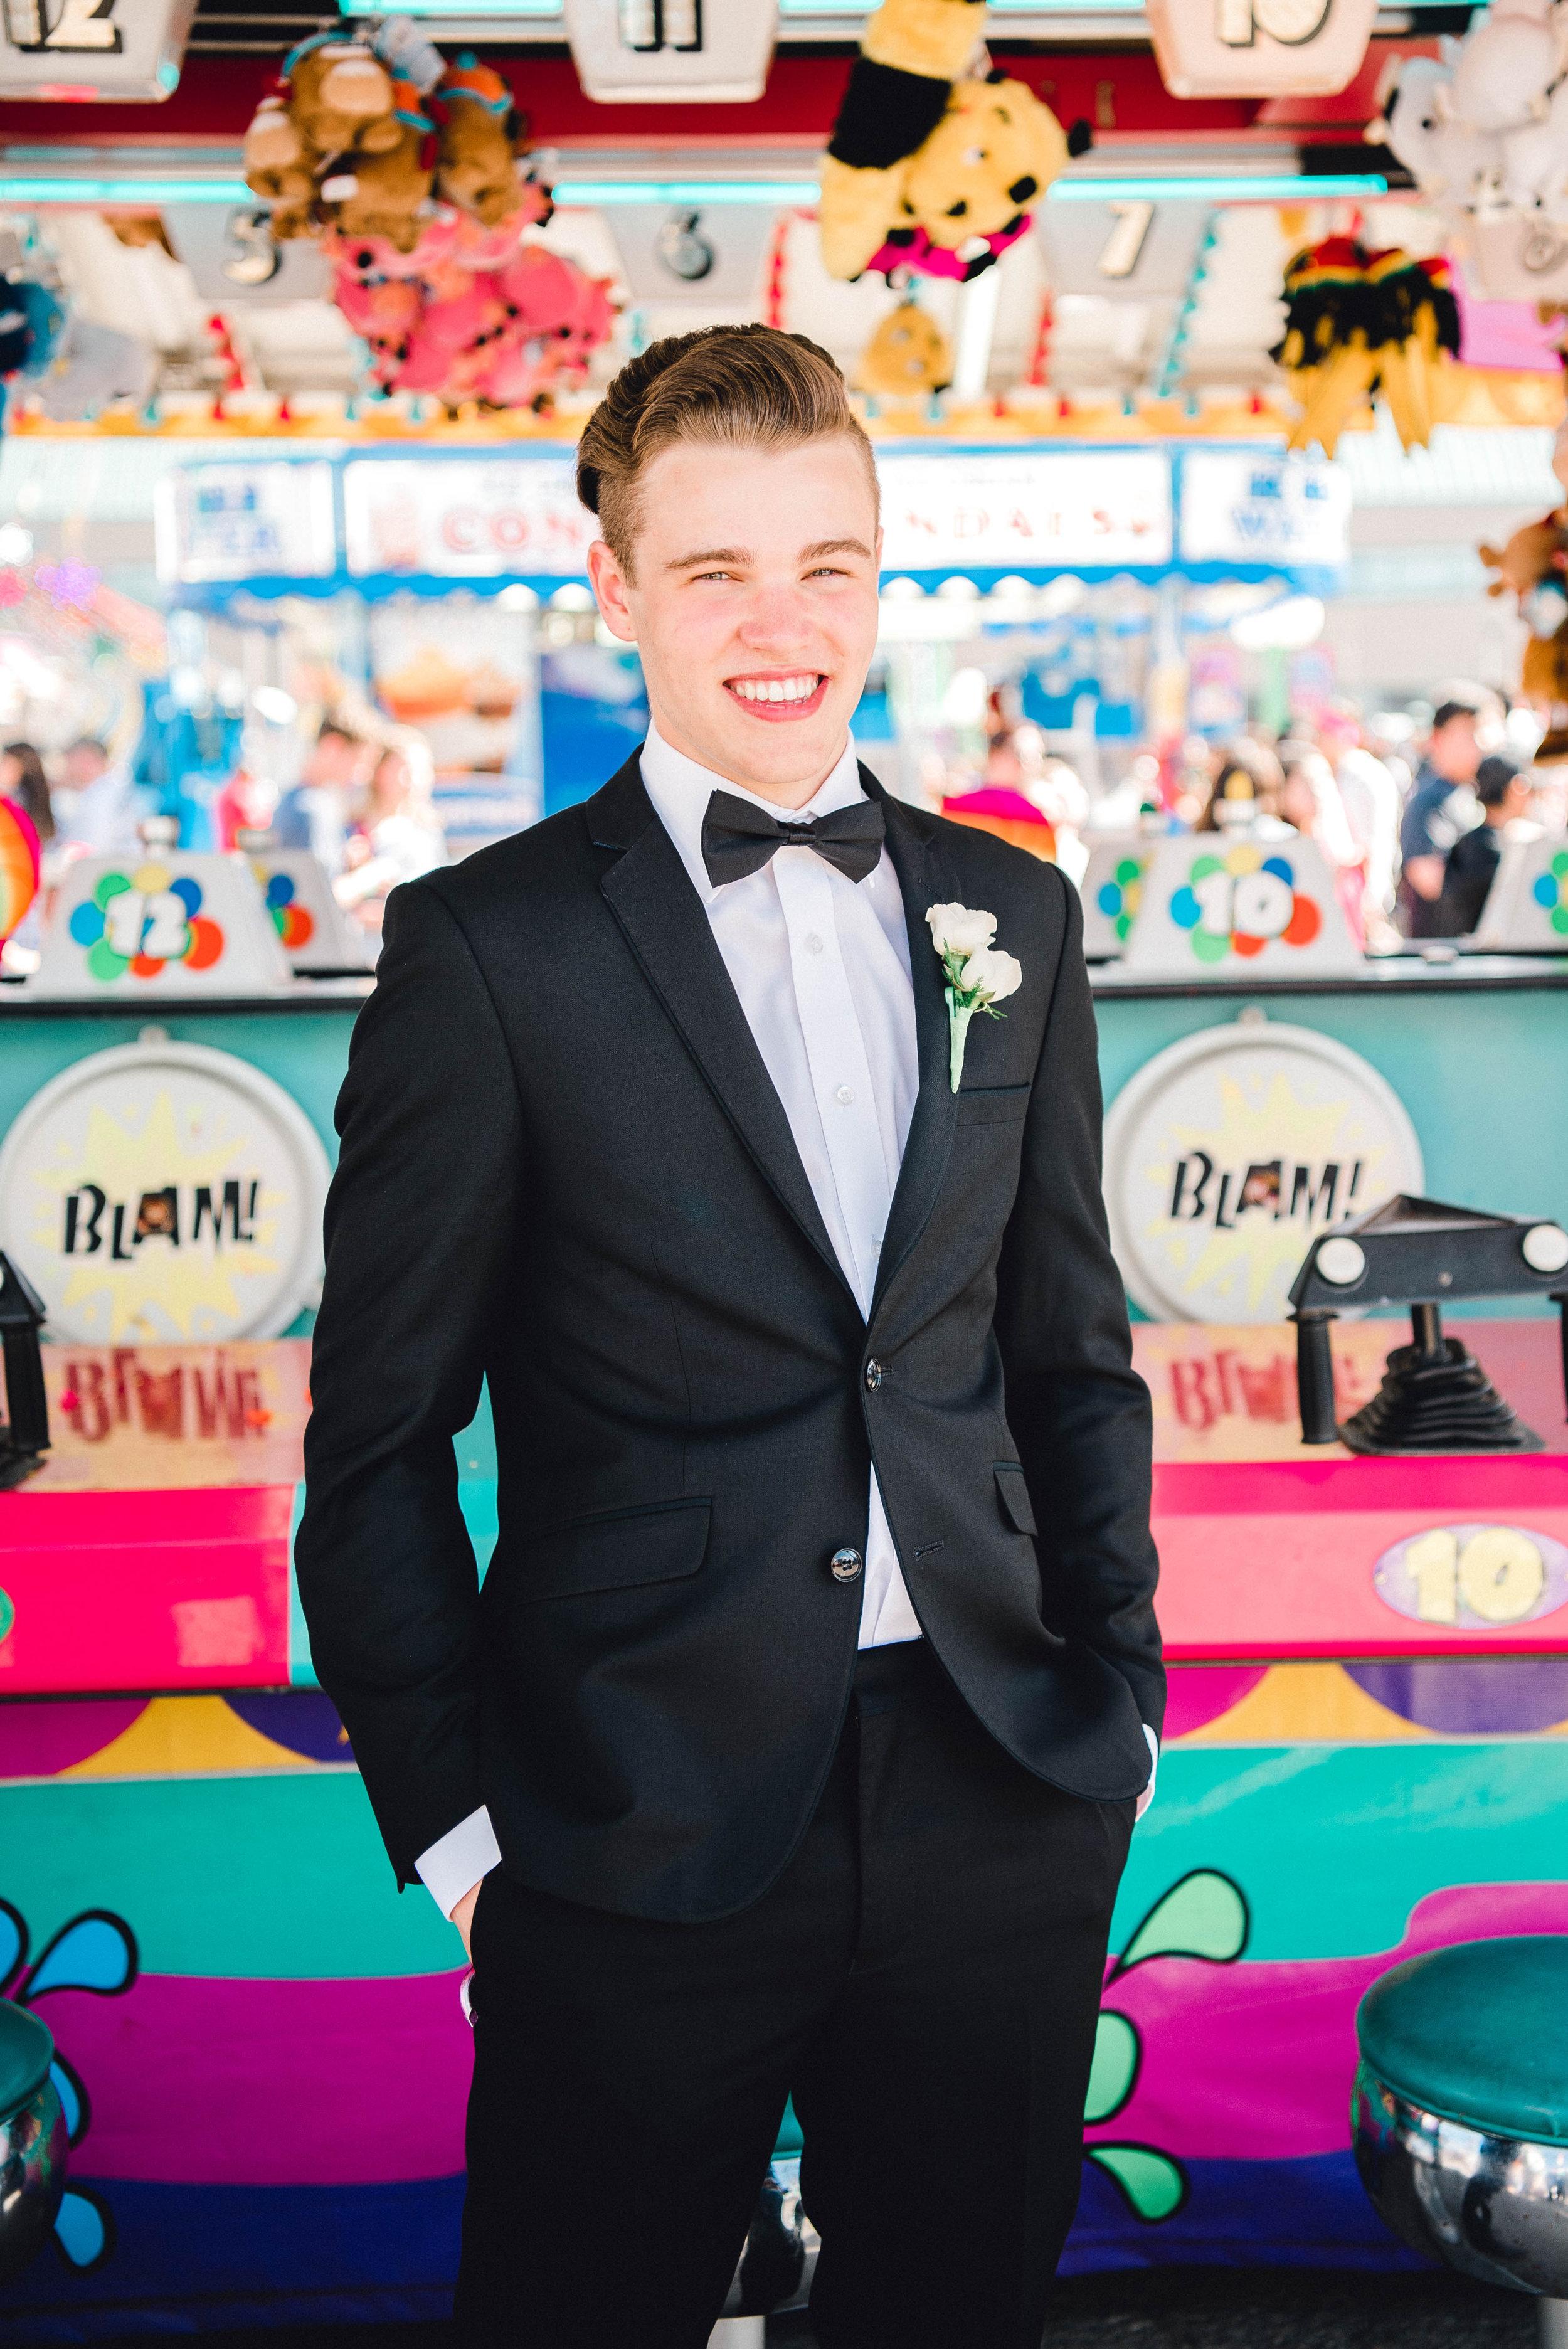 Prom2018 (29 of 104).jpg